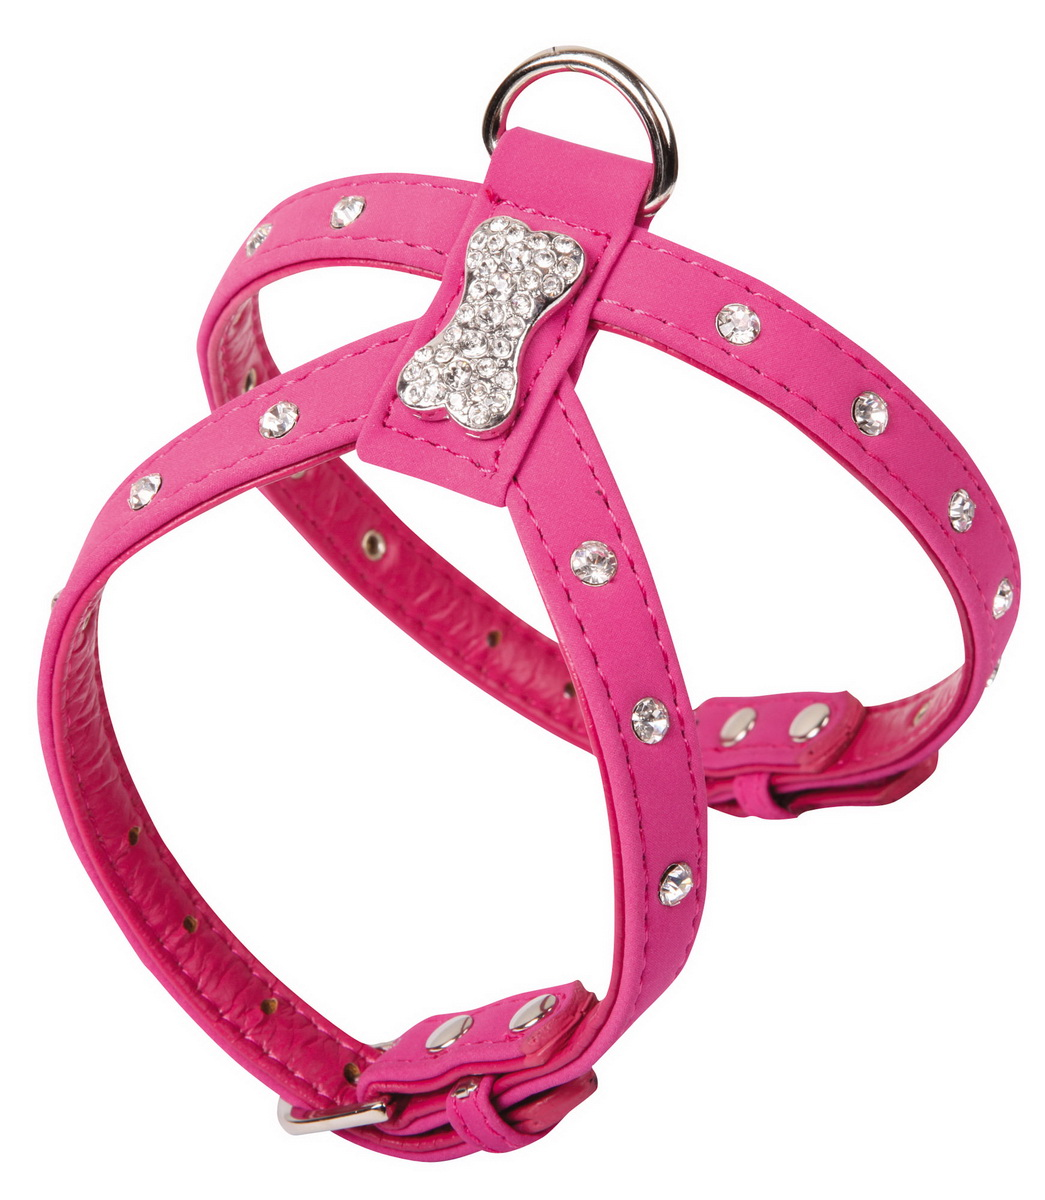 Шлейка для собак Dezzie, цвет: розовый, обхват шеи 15-20 см, обхват груди 22-27 см. Размер S. 5624078 шлейка для собак dezzie цвет черный ширина 1 см обхват шеи 25 см обхват груди 28 33 см размер s 5624007